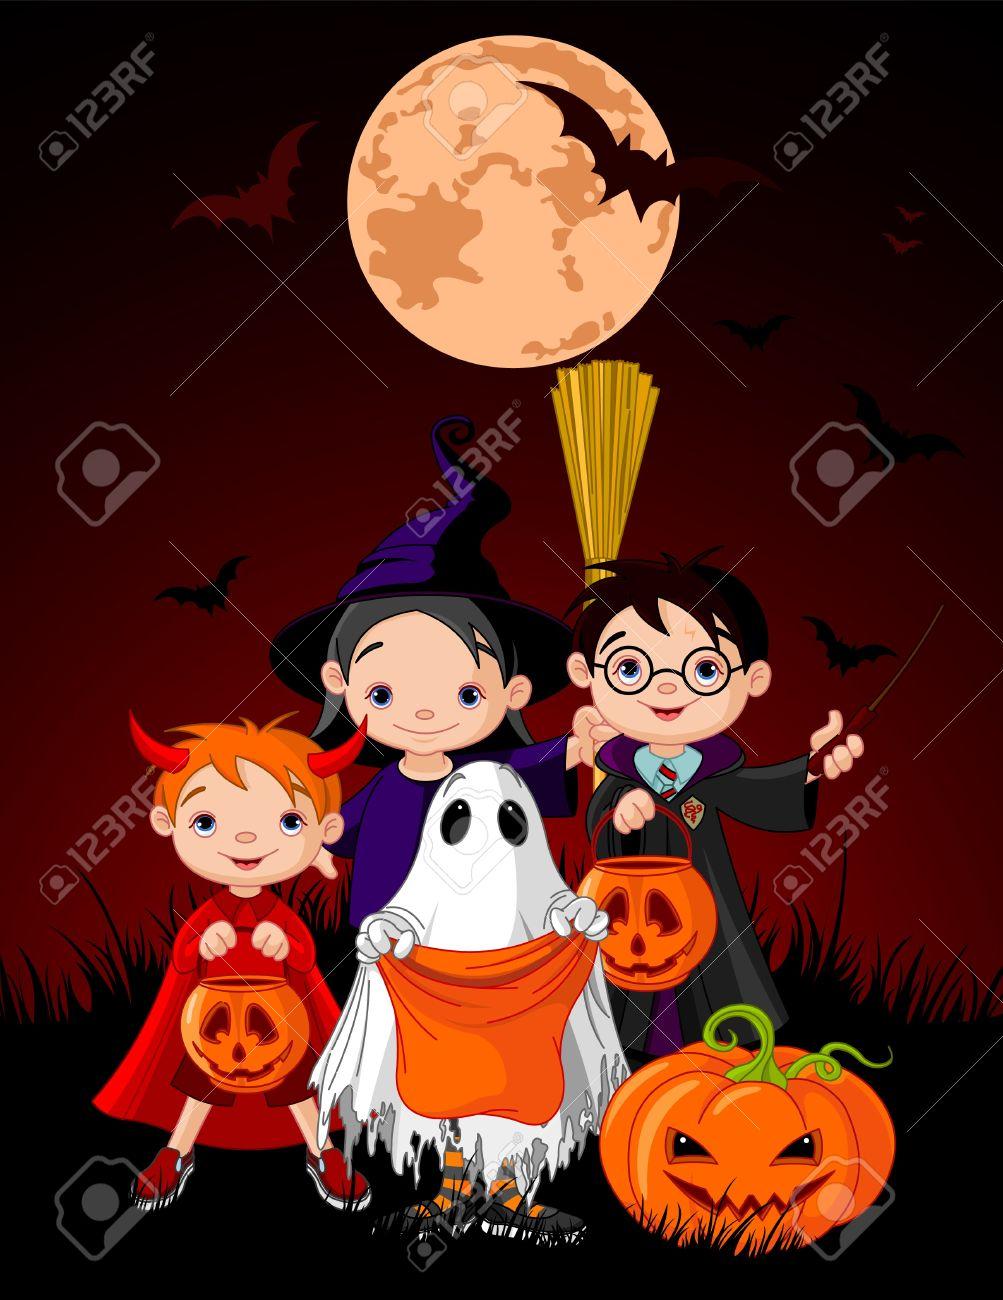 Halloween background with children trick or treating in Halloween costume Stock Vector - 10845816